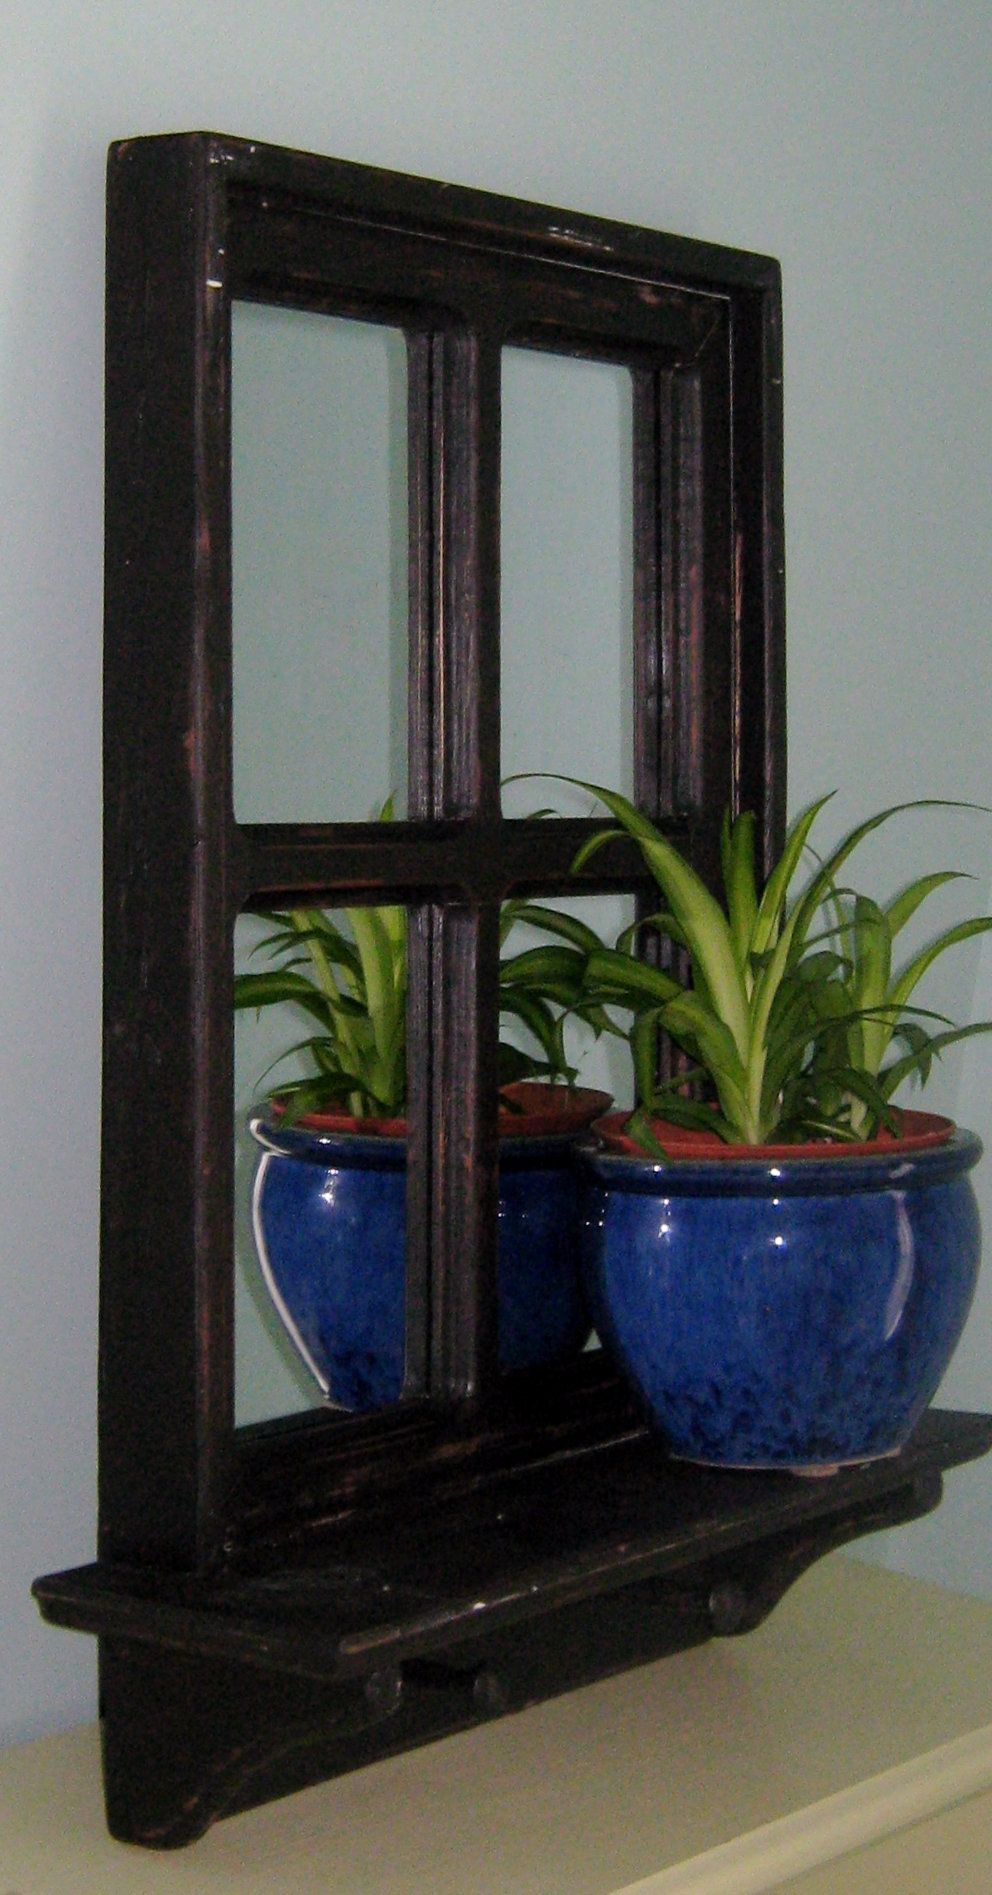 Farmhouse Window Pane Mirror In 2020 Shabby Chic Mirror Window Mirror Window Pane Mirror